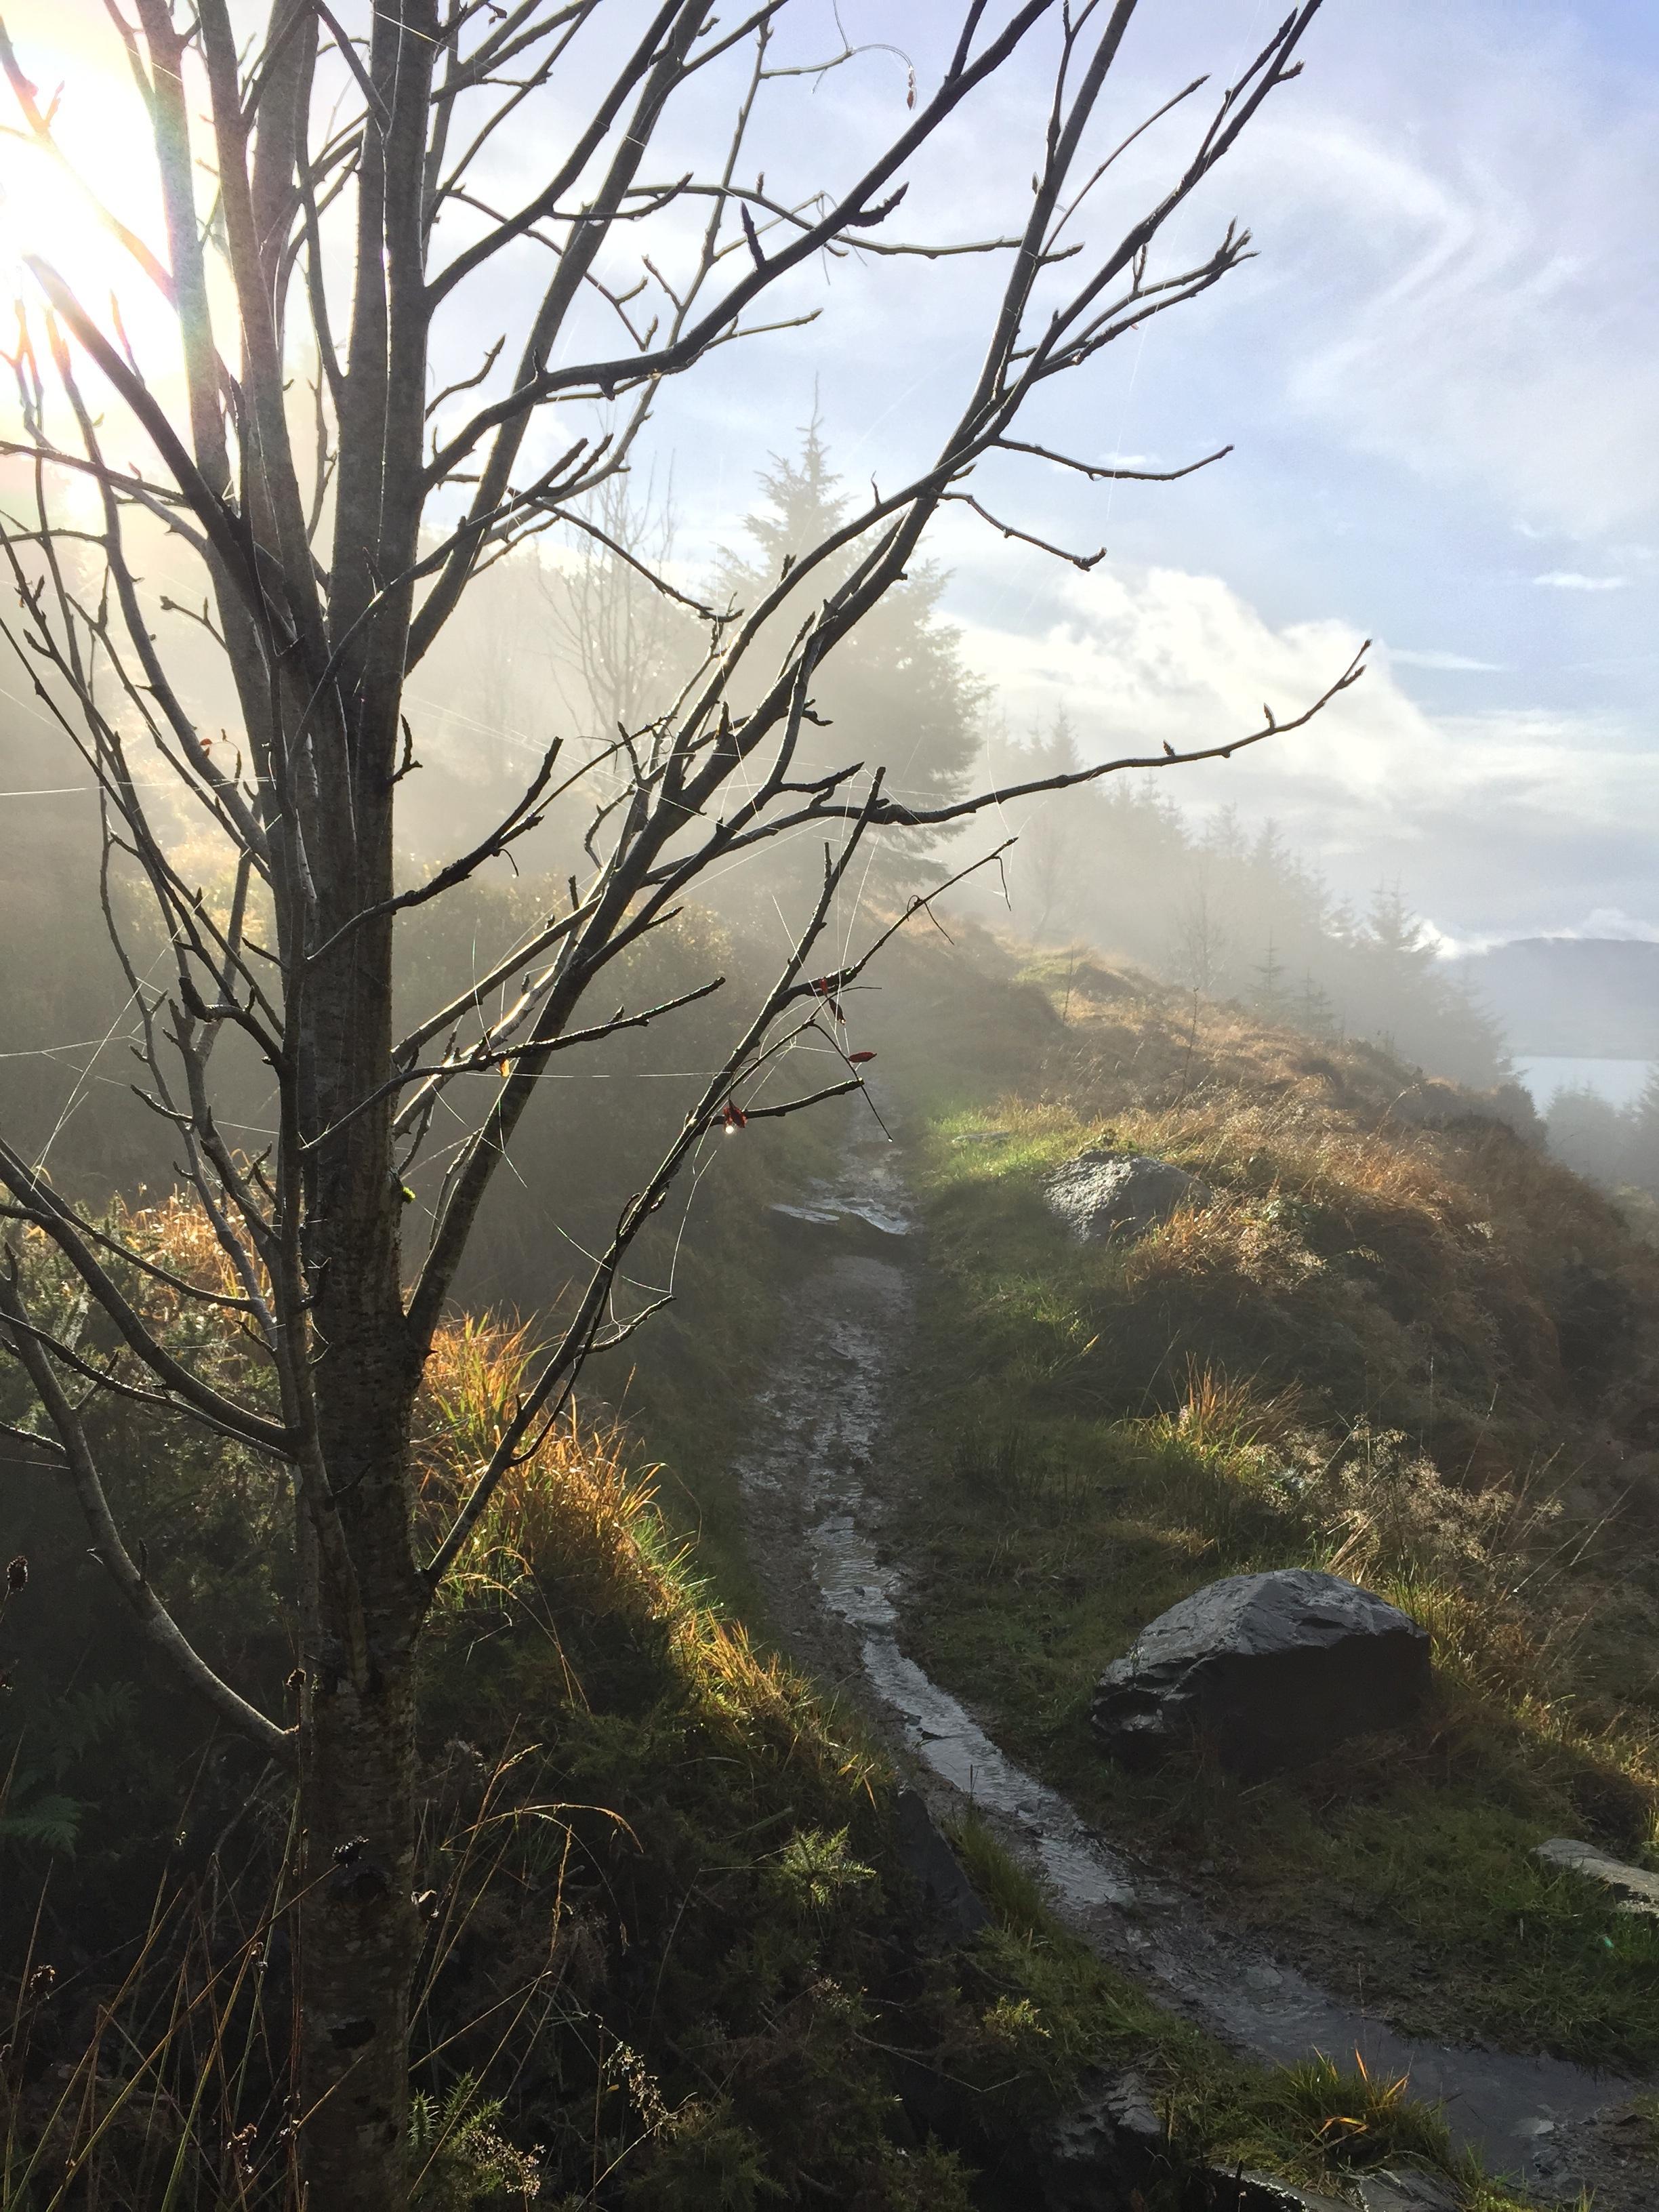 wet_rain_trees_kilbroney_forest_trails_rostrevor_mtb_mountainbiking_ni_explorer_niexplorer_northern_ireland_blog.jpg